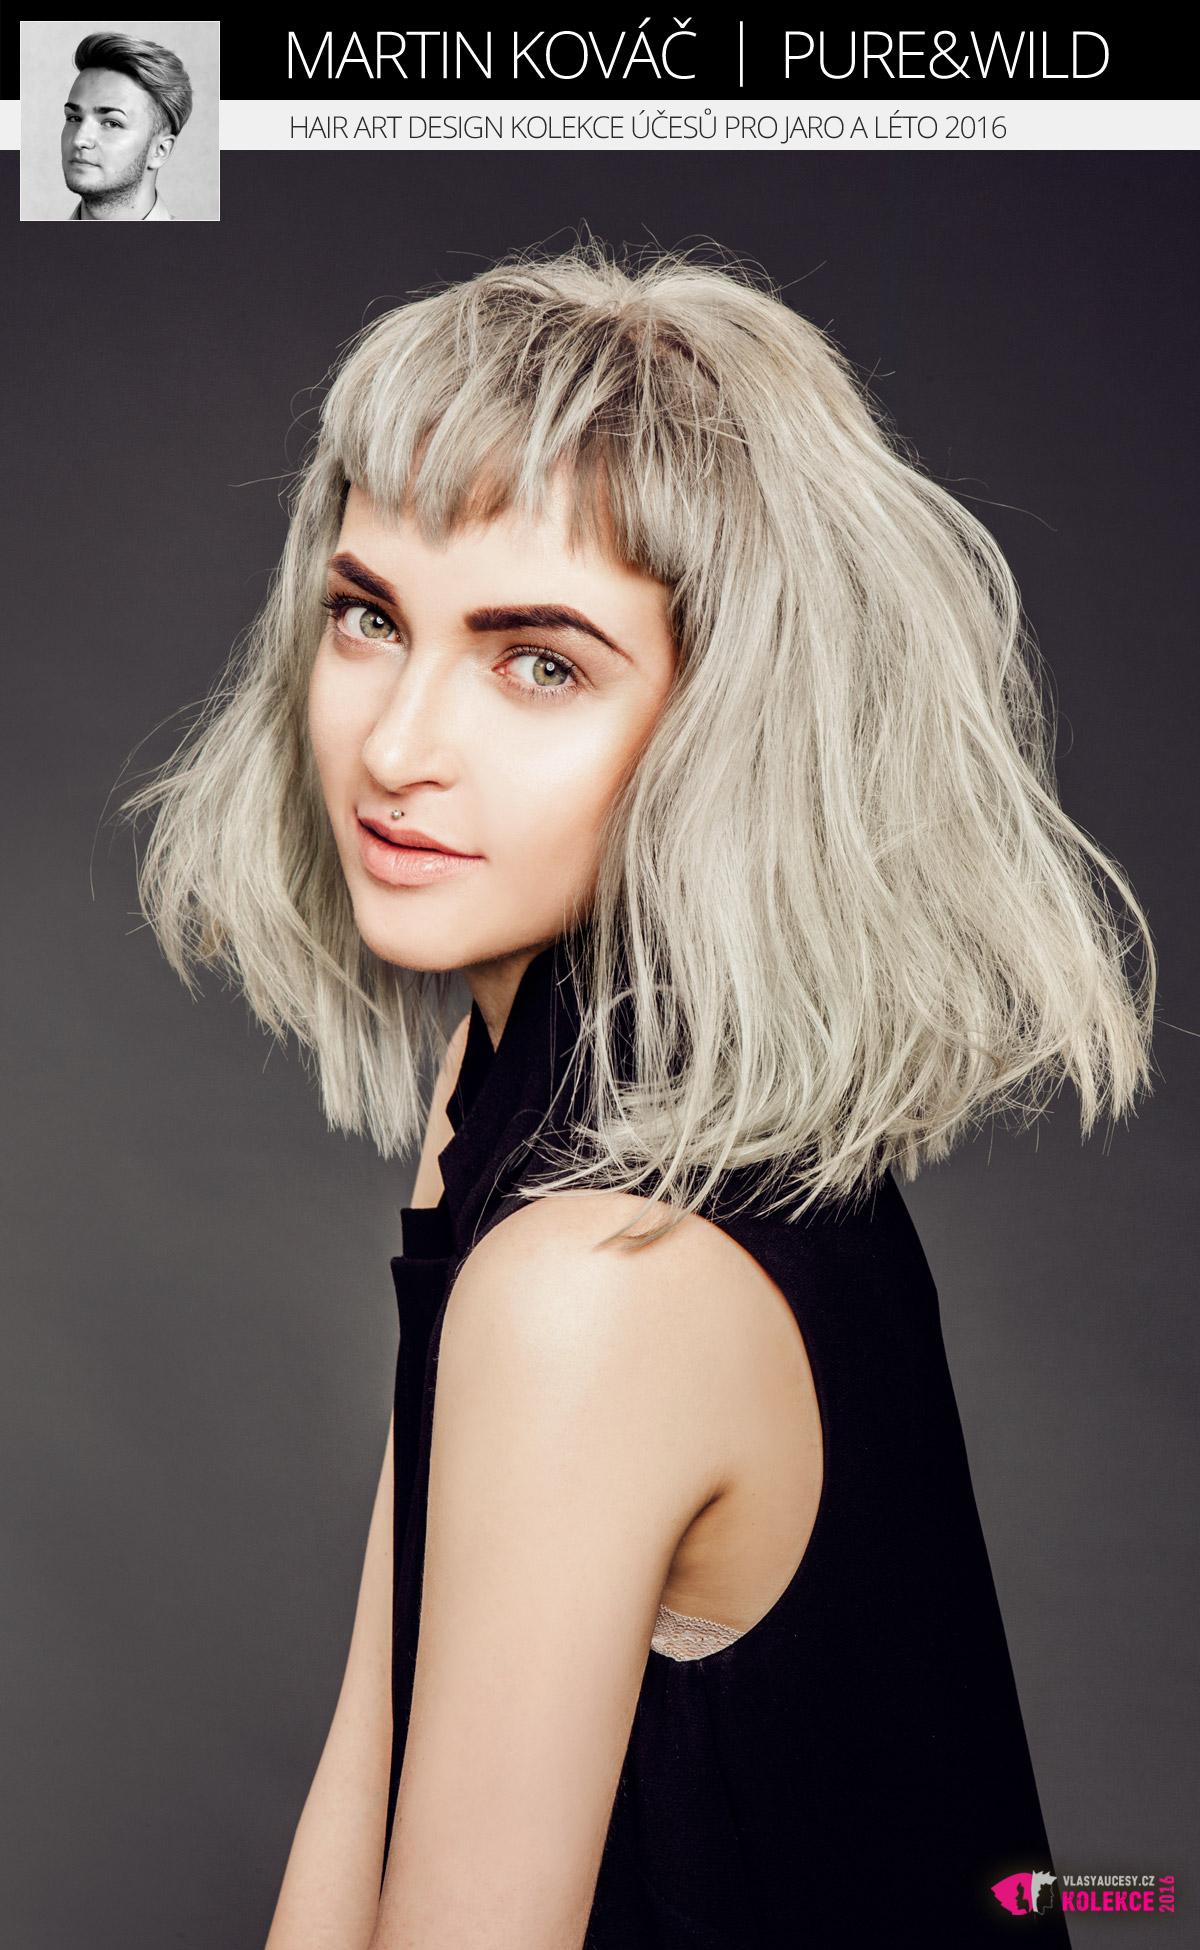 Hair Art Design – kolekce Pure&Wild